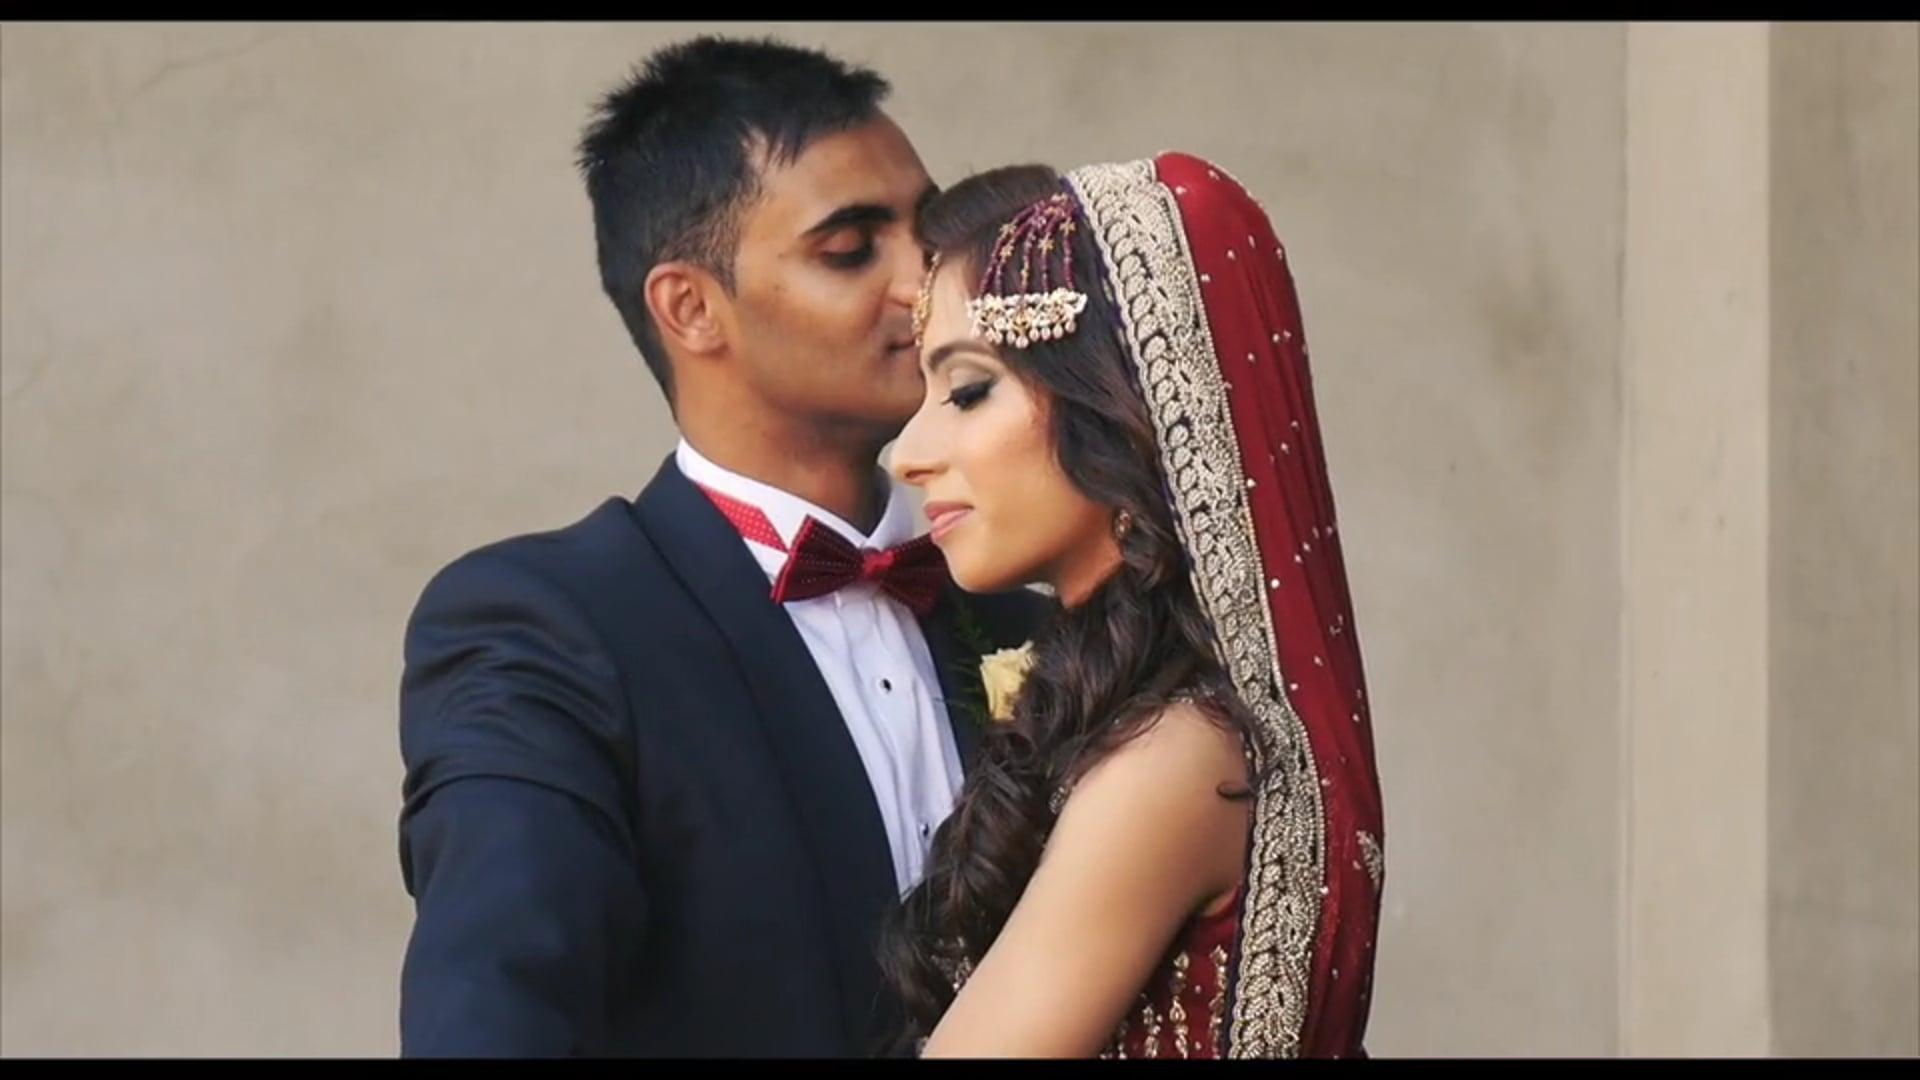 Raphay + Salva - The Wedding Film // Ferndara